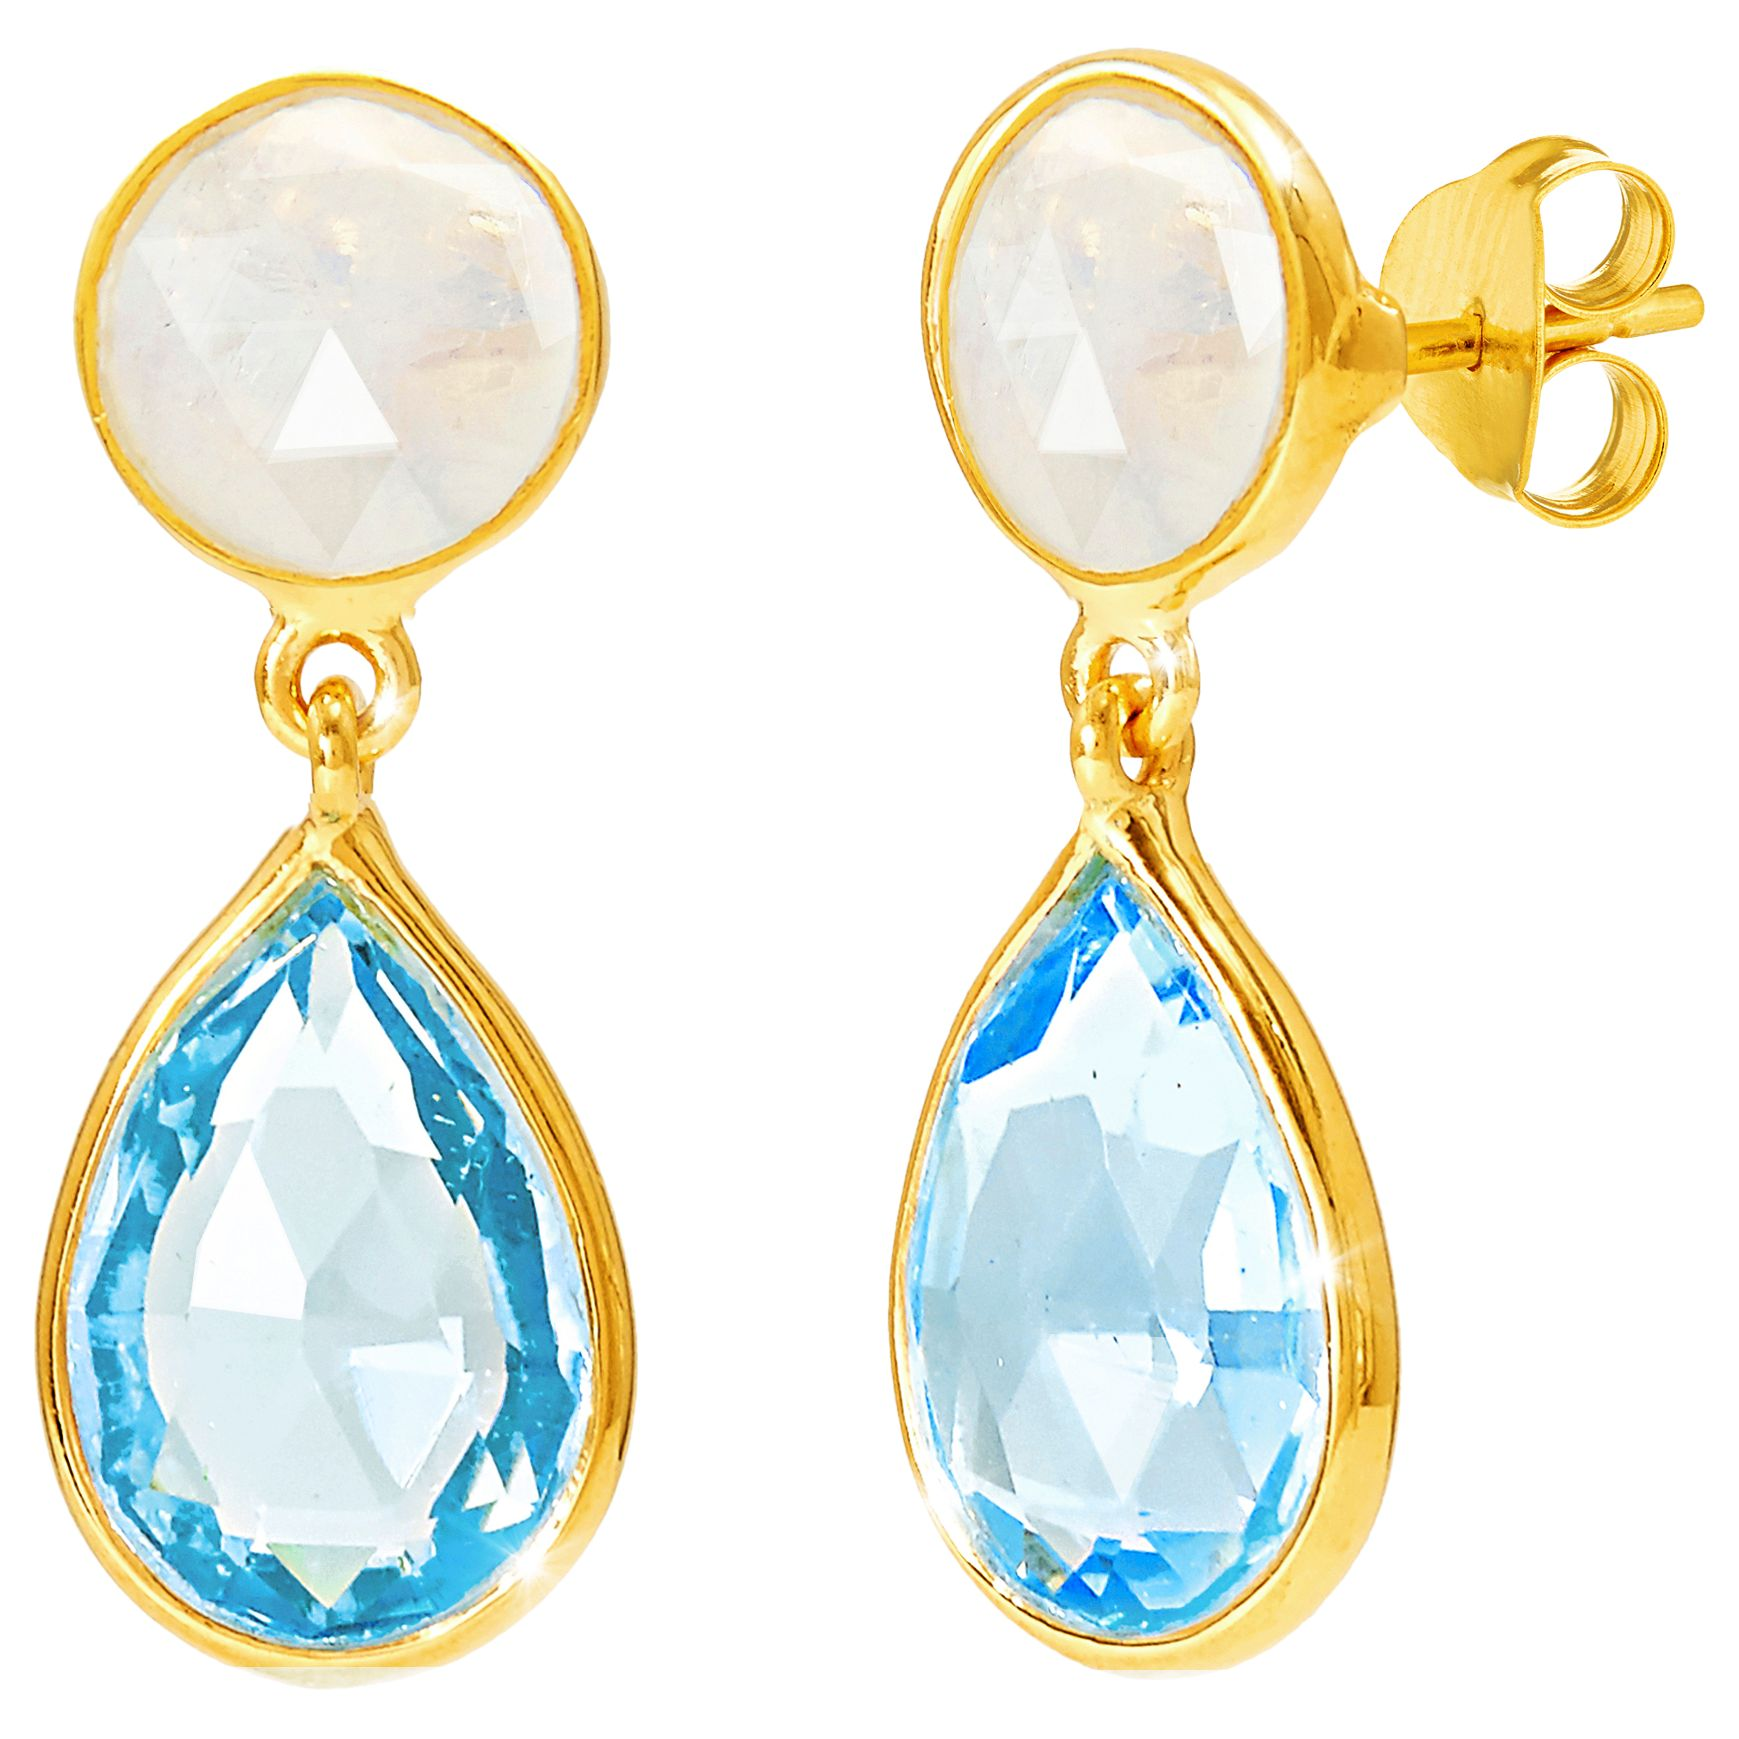 Real 18ct yellow gold plated drop earrings black moonstone teardrop gem gift bag